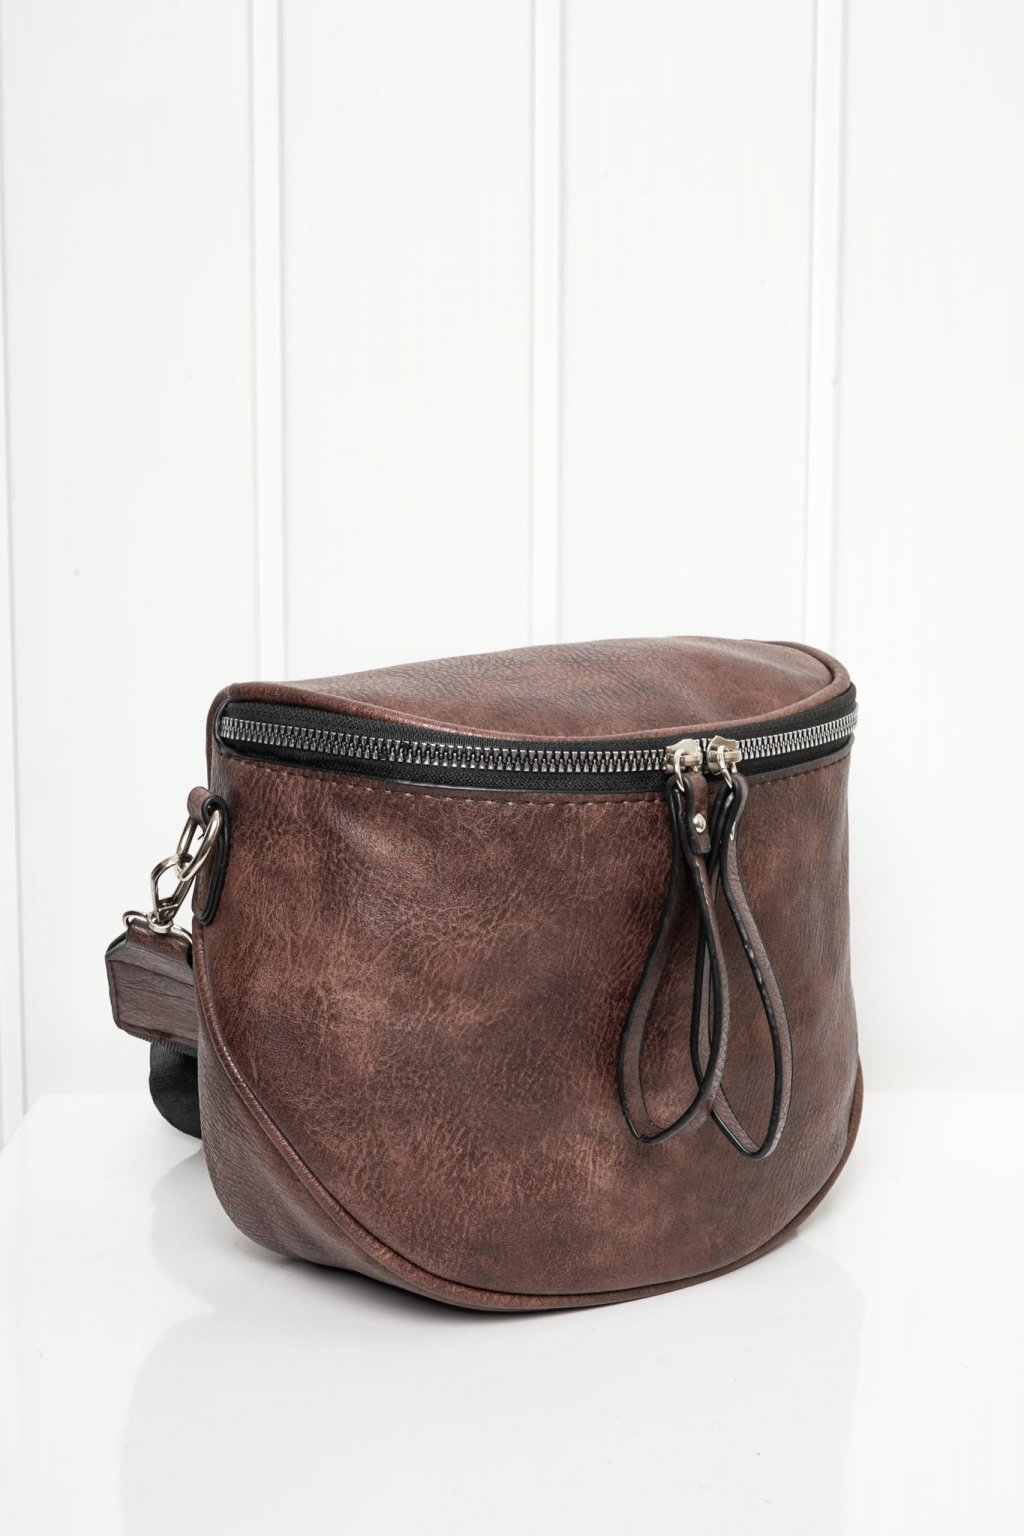 Kabelka, crossbody, ruksak, shopping bag, shopperka, 238